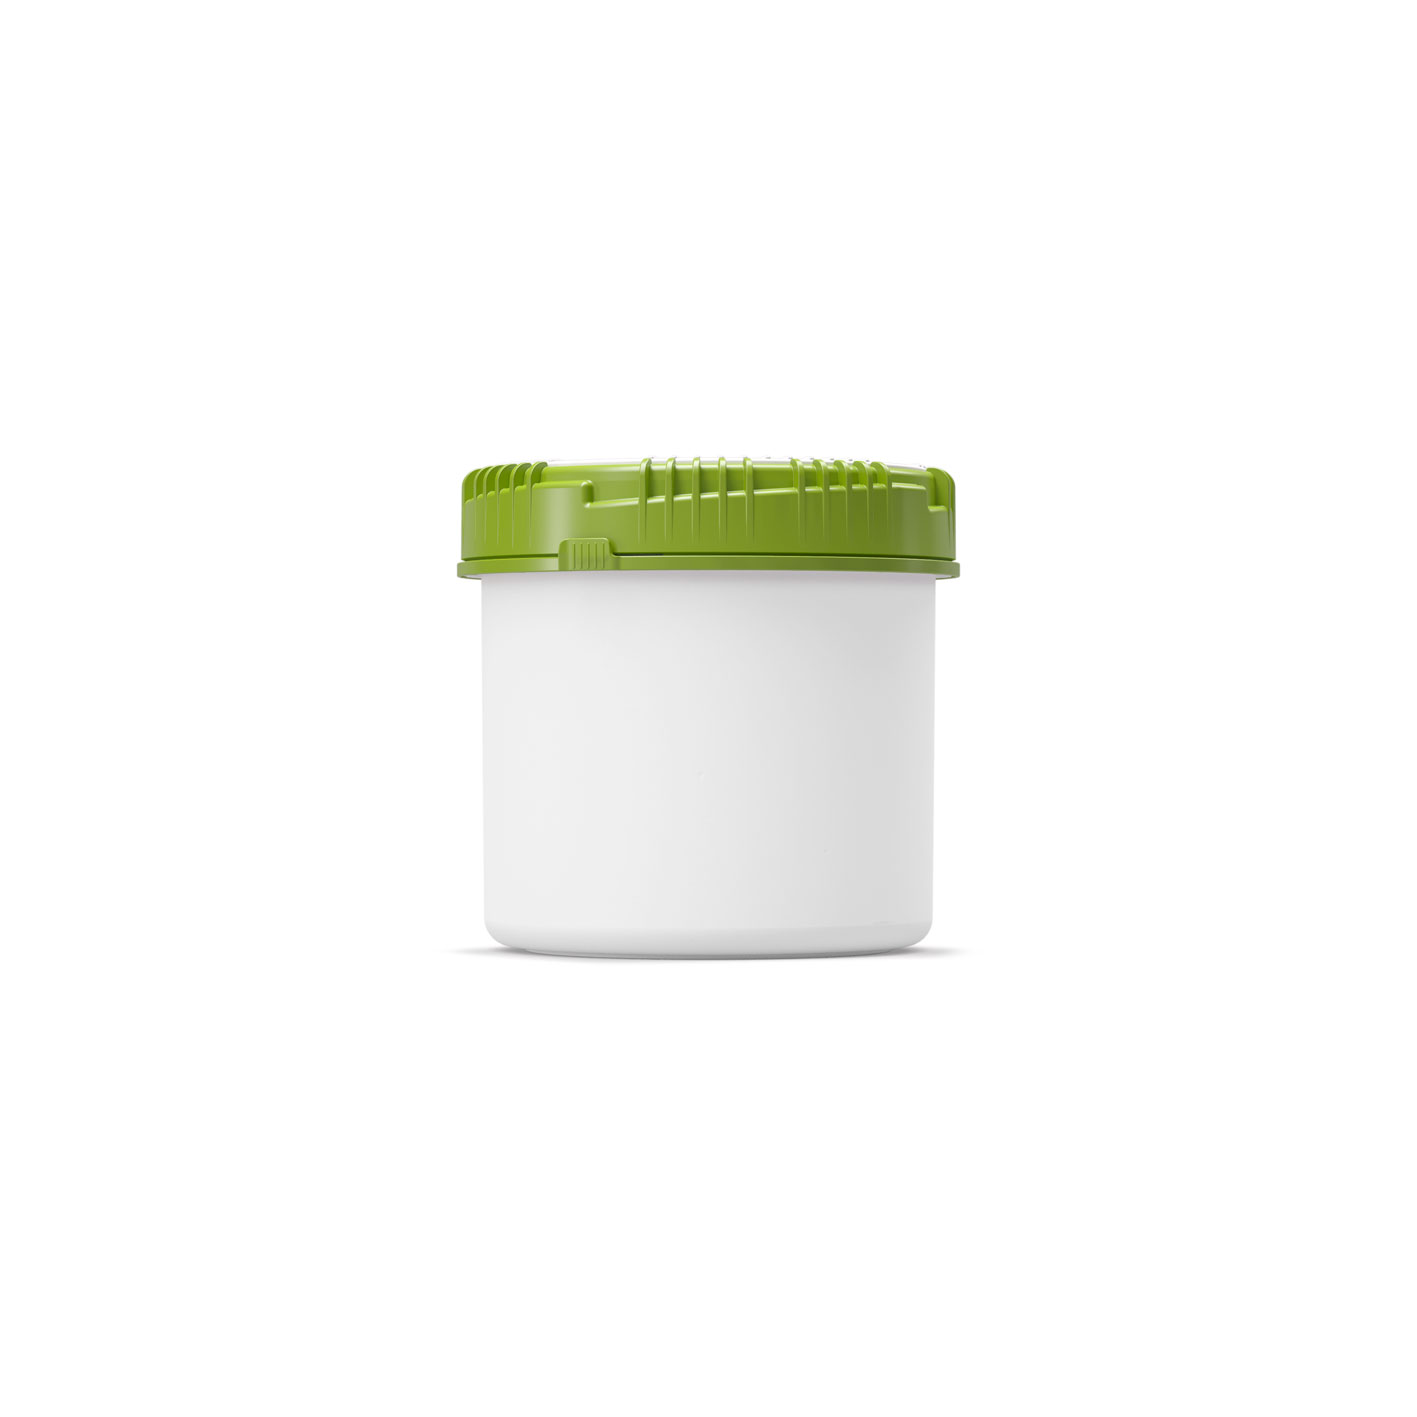 650 ml Biobased Packo - 7